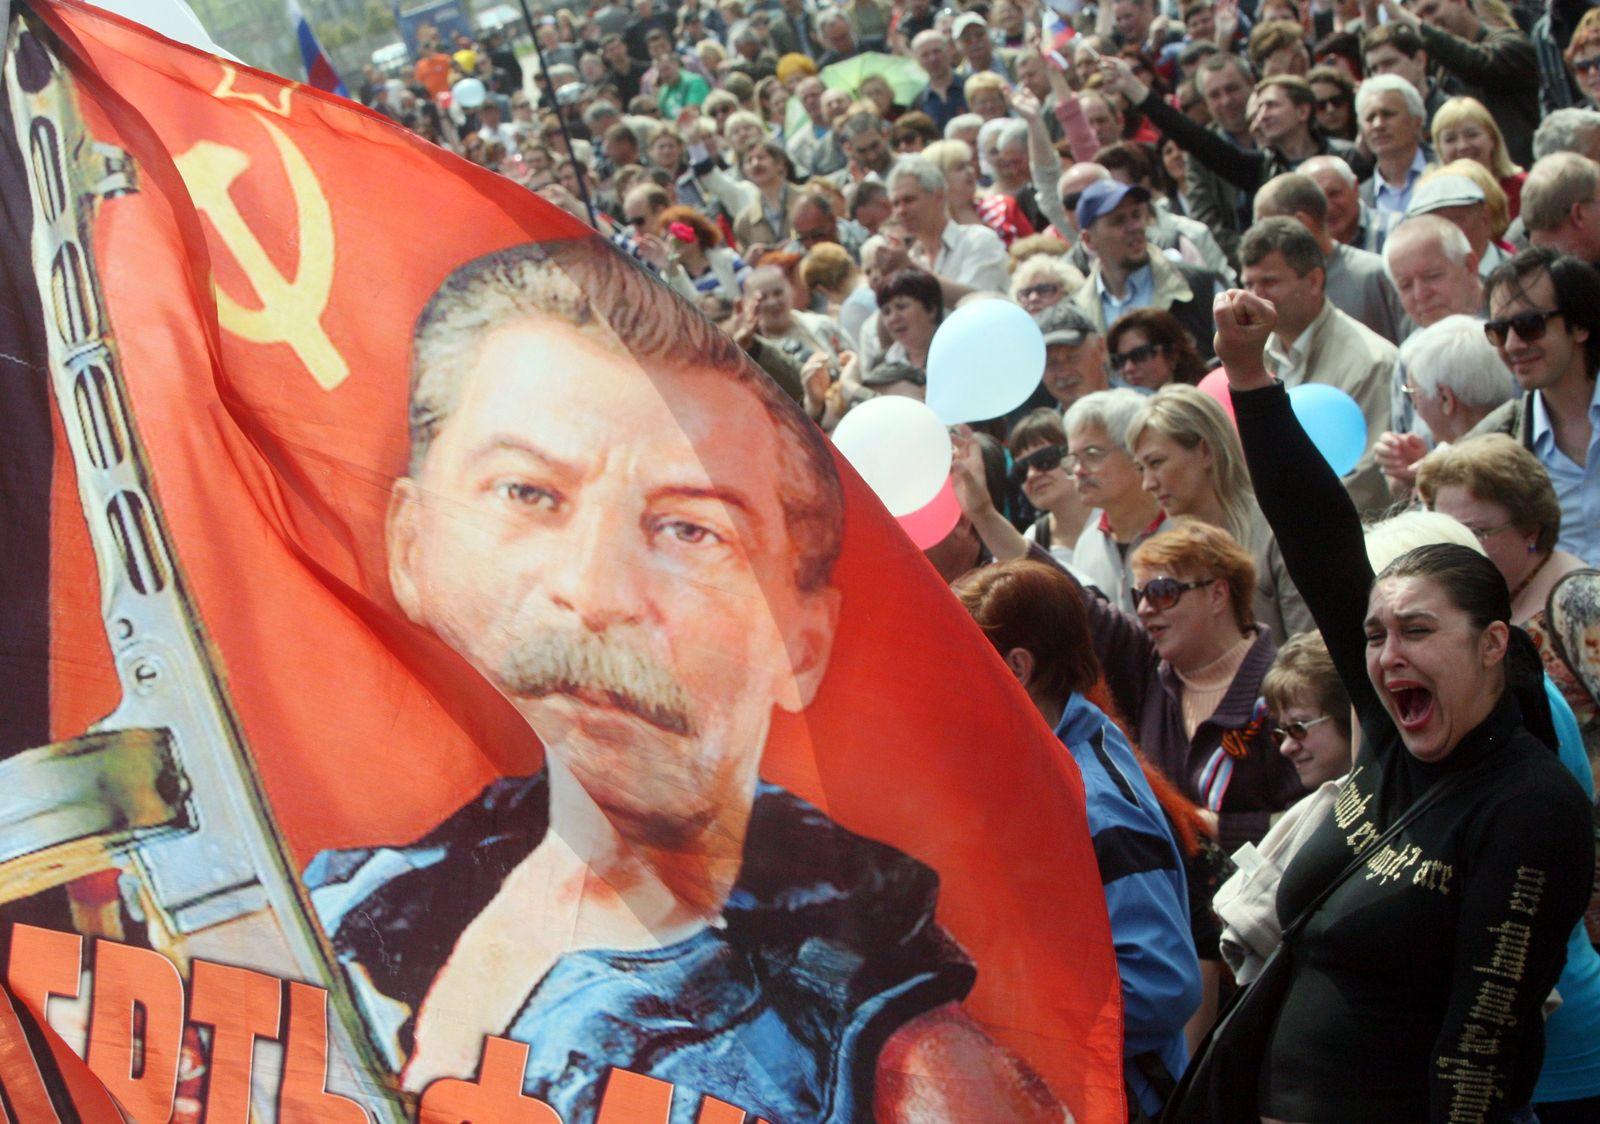 UKRAINE-RUSSIA-CRISIS-POLITICS-MAY1-DAY-PROTEST